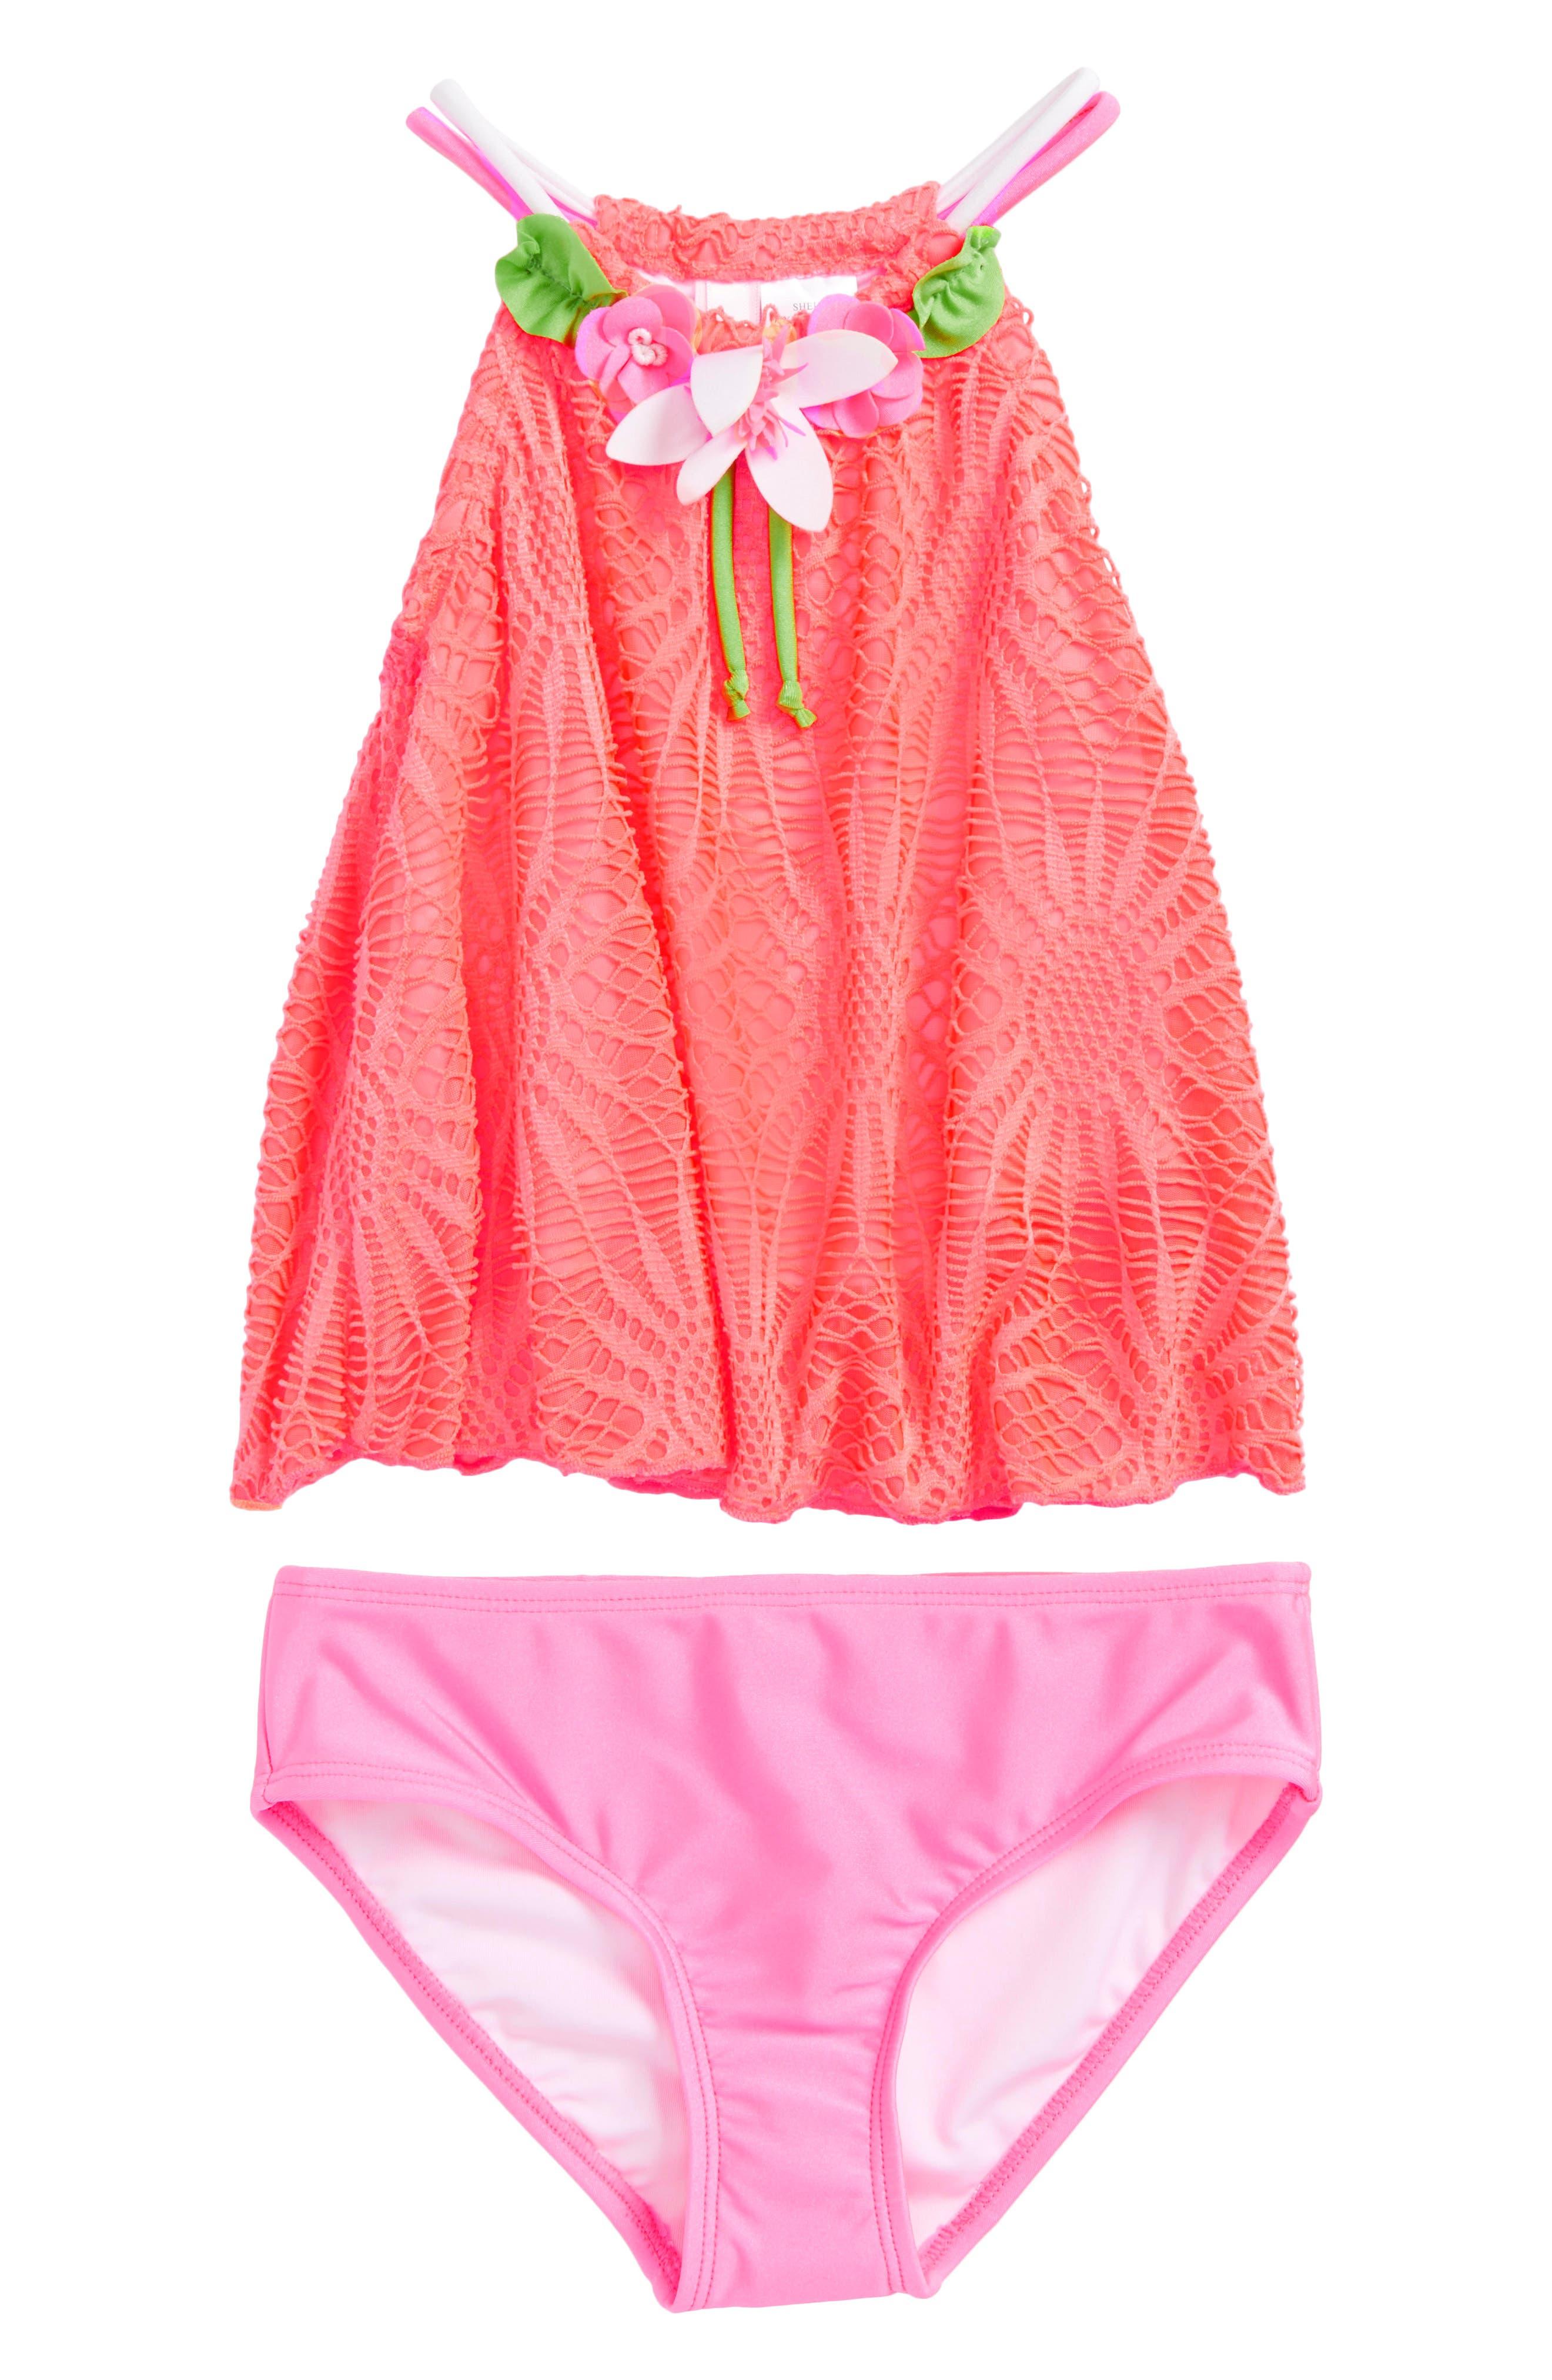 Crochet Tankini Two-Piece Swimsuit,                             Main thumbnail 1, color,                             950